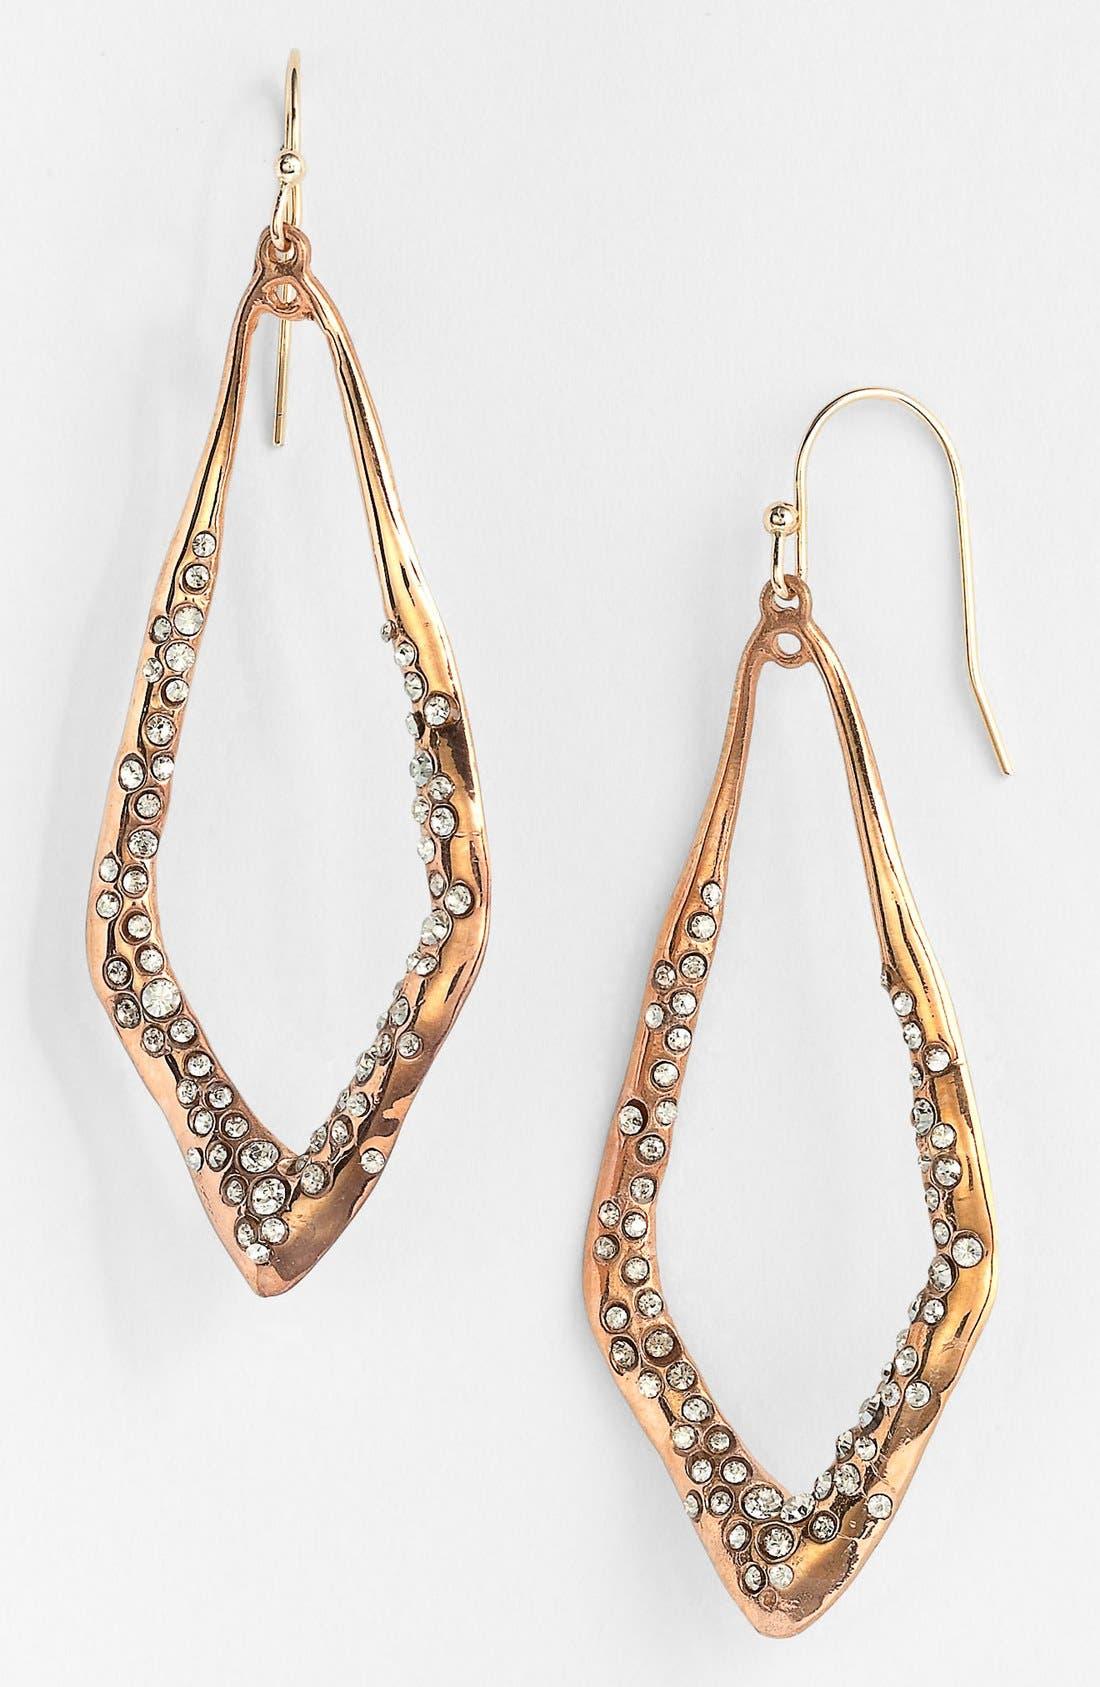 Alternate Image 1 Selected - Alexis Bittar 'Miss Havisham' Open Drop Earrings (Nordstrom Exclusive)